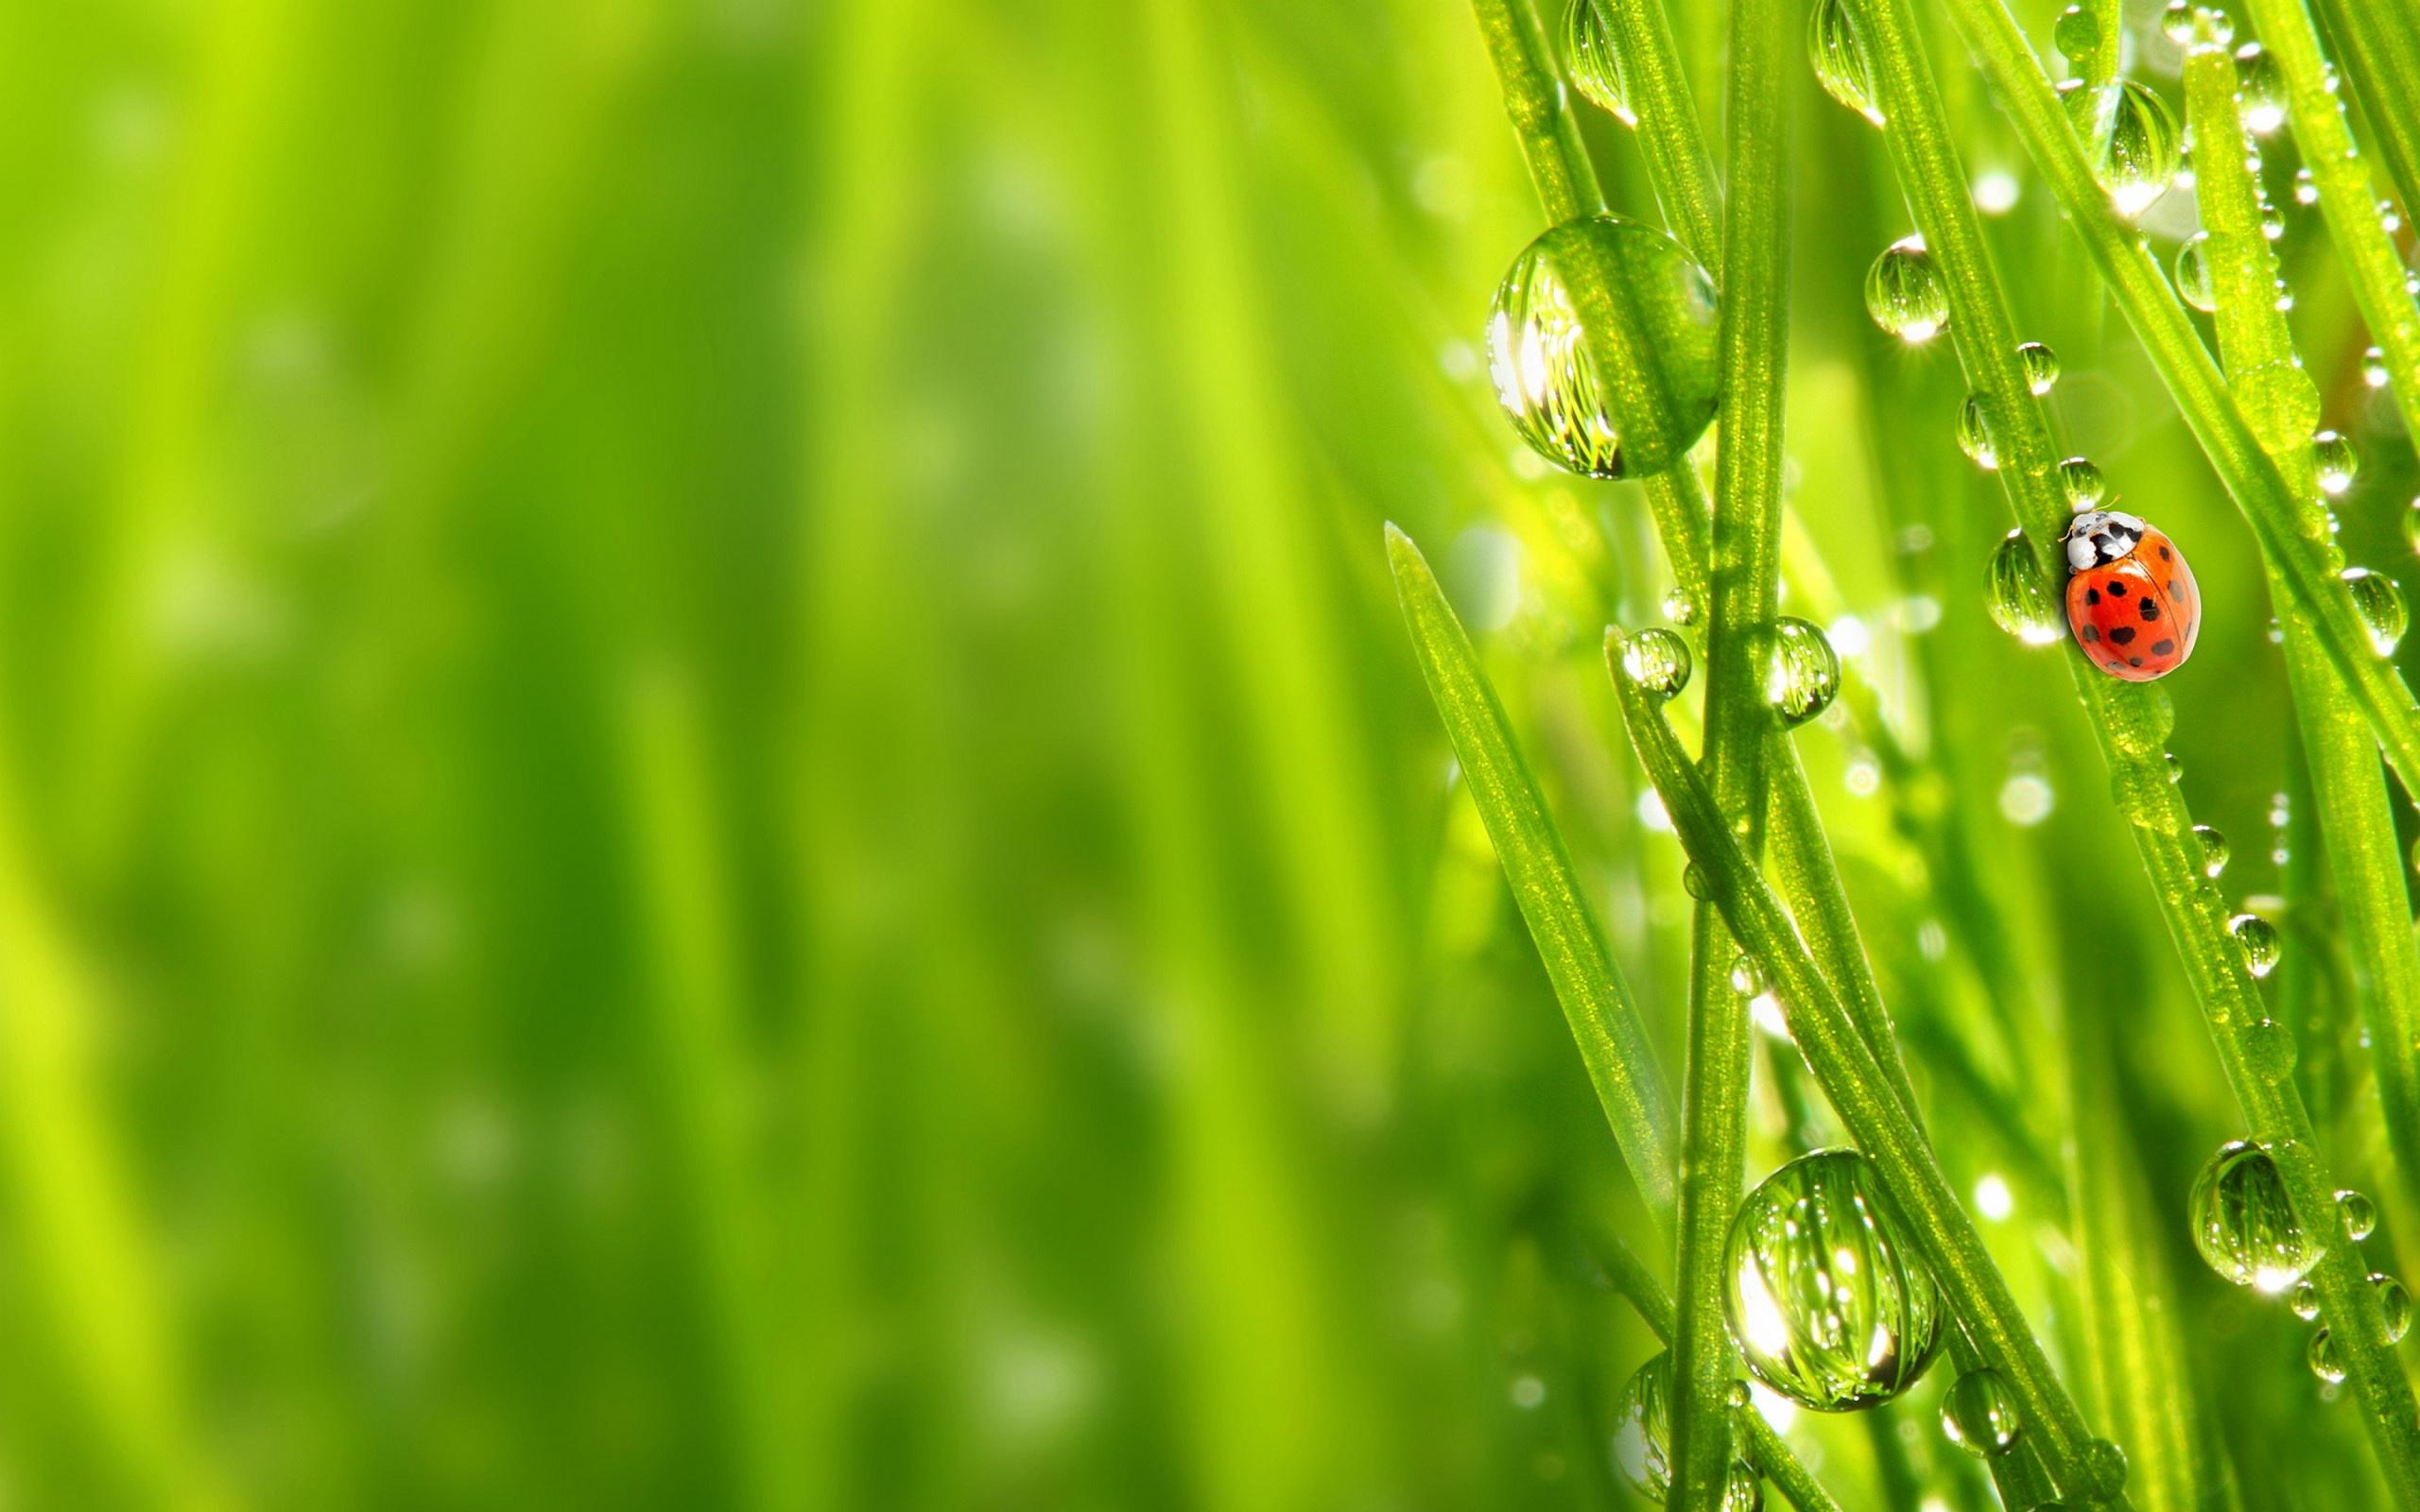 Grass Wallpaper - WallpaperSafari